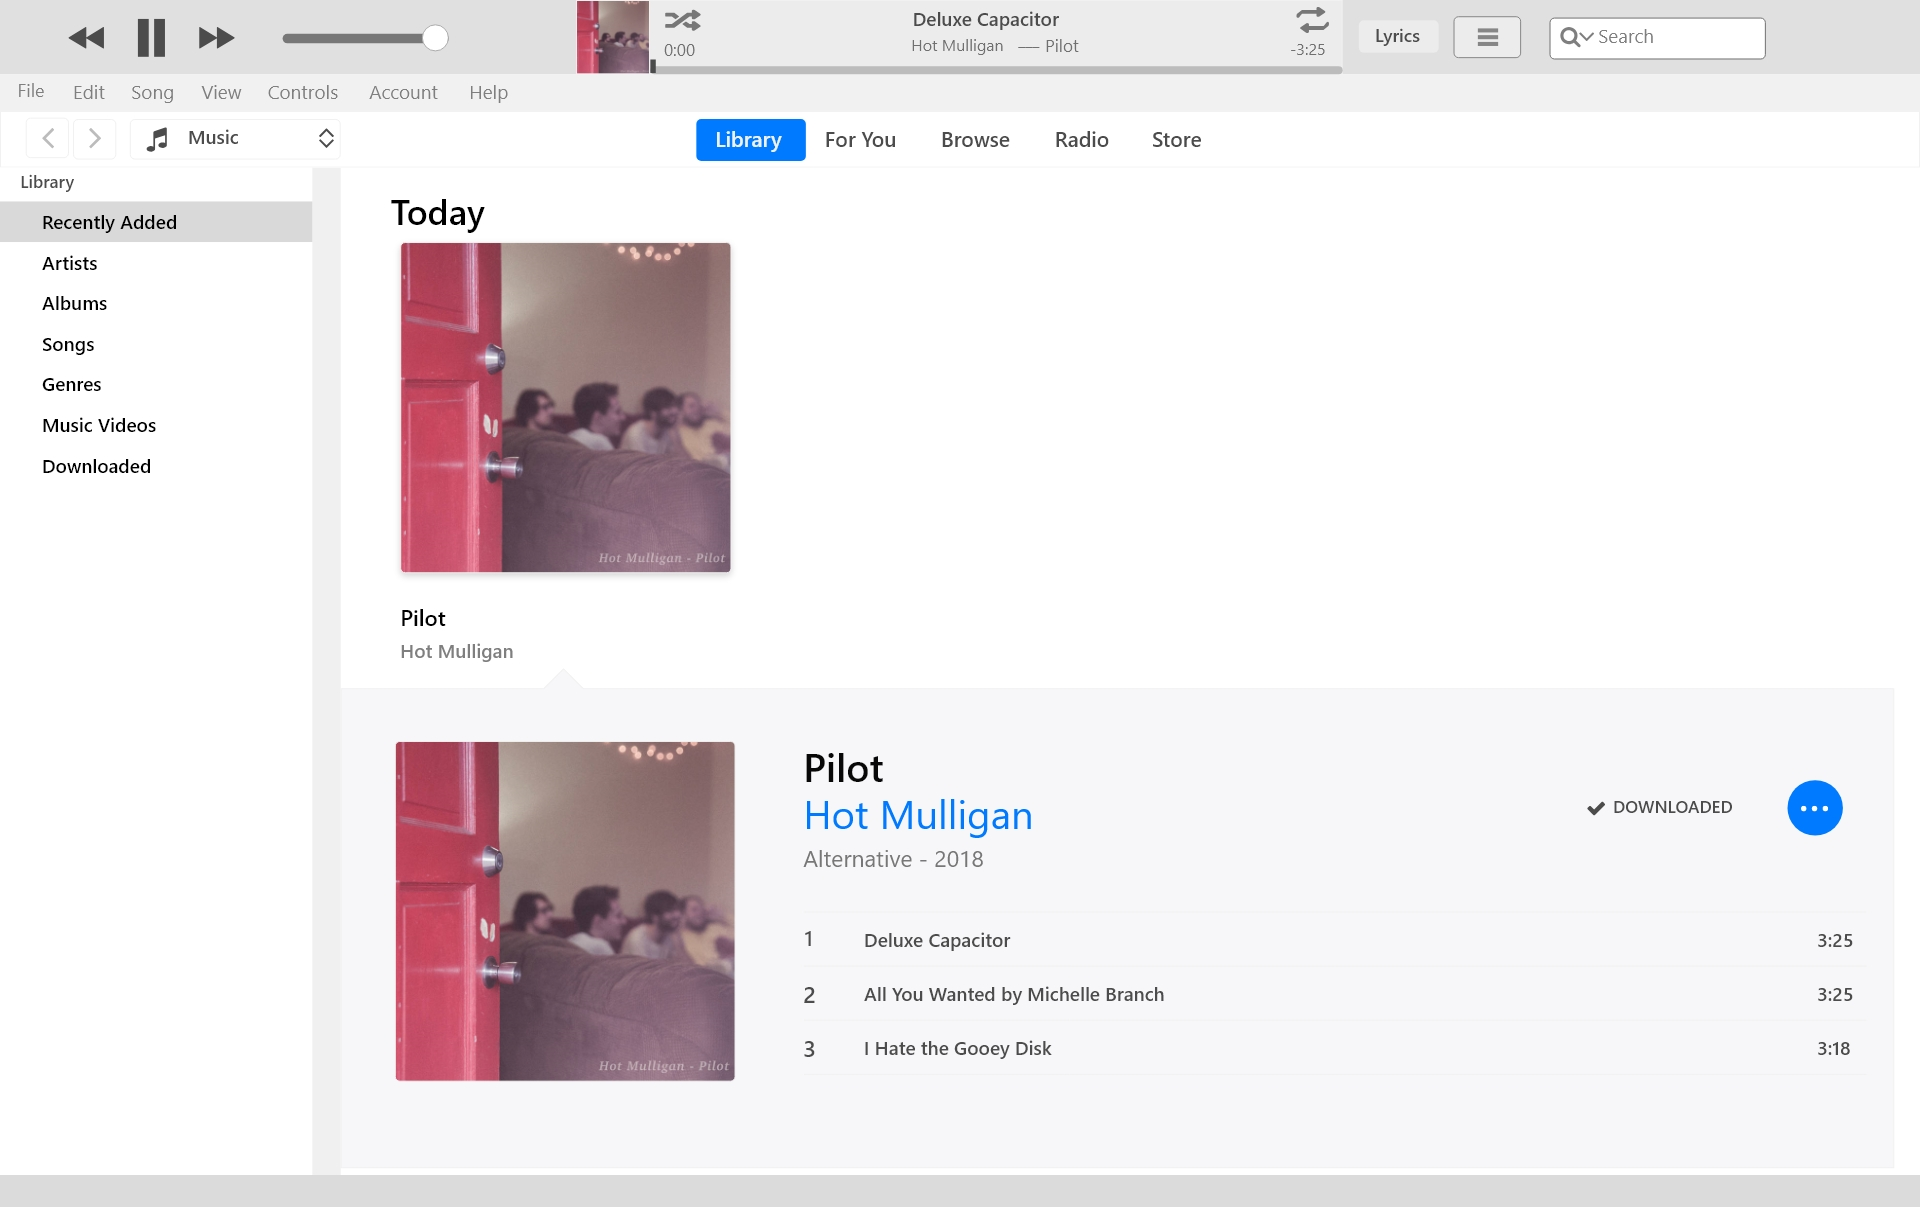 UX Study Case: iTunes and lyrics integration - Adobe XD